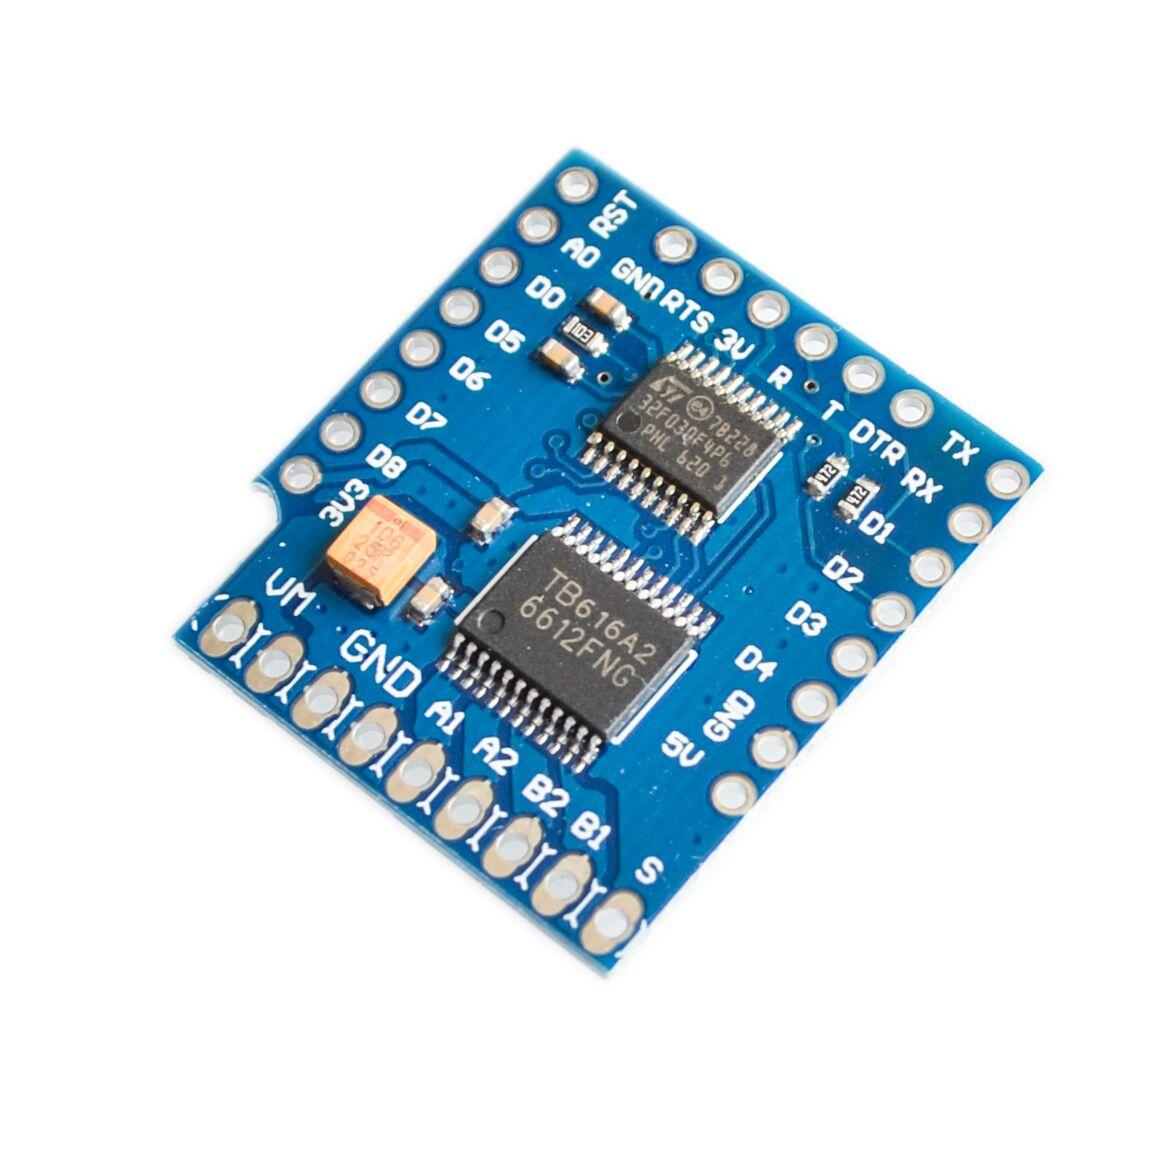 Elektronische Bauelemente 1A V1.0.0 M85 Motor Shield For WeMos D1 ...